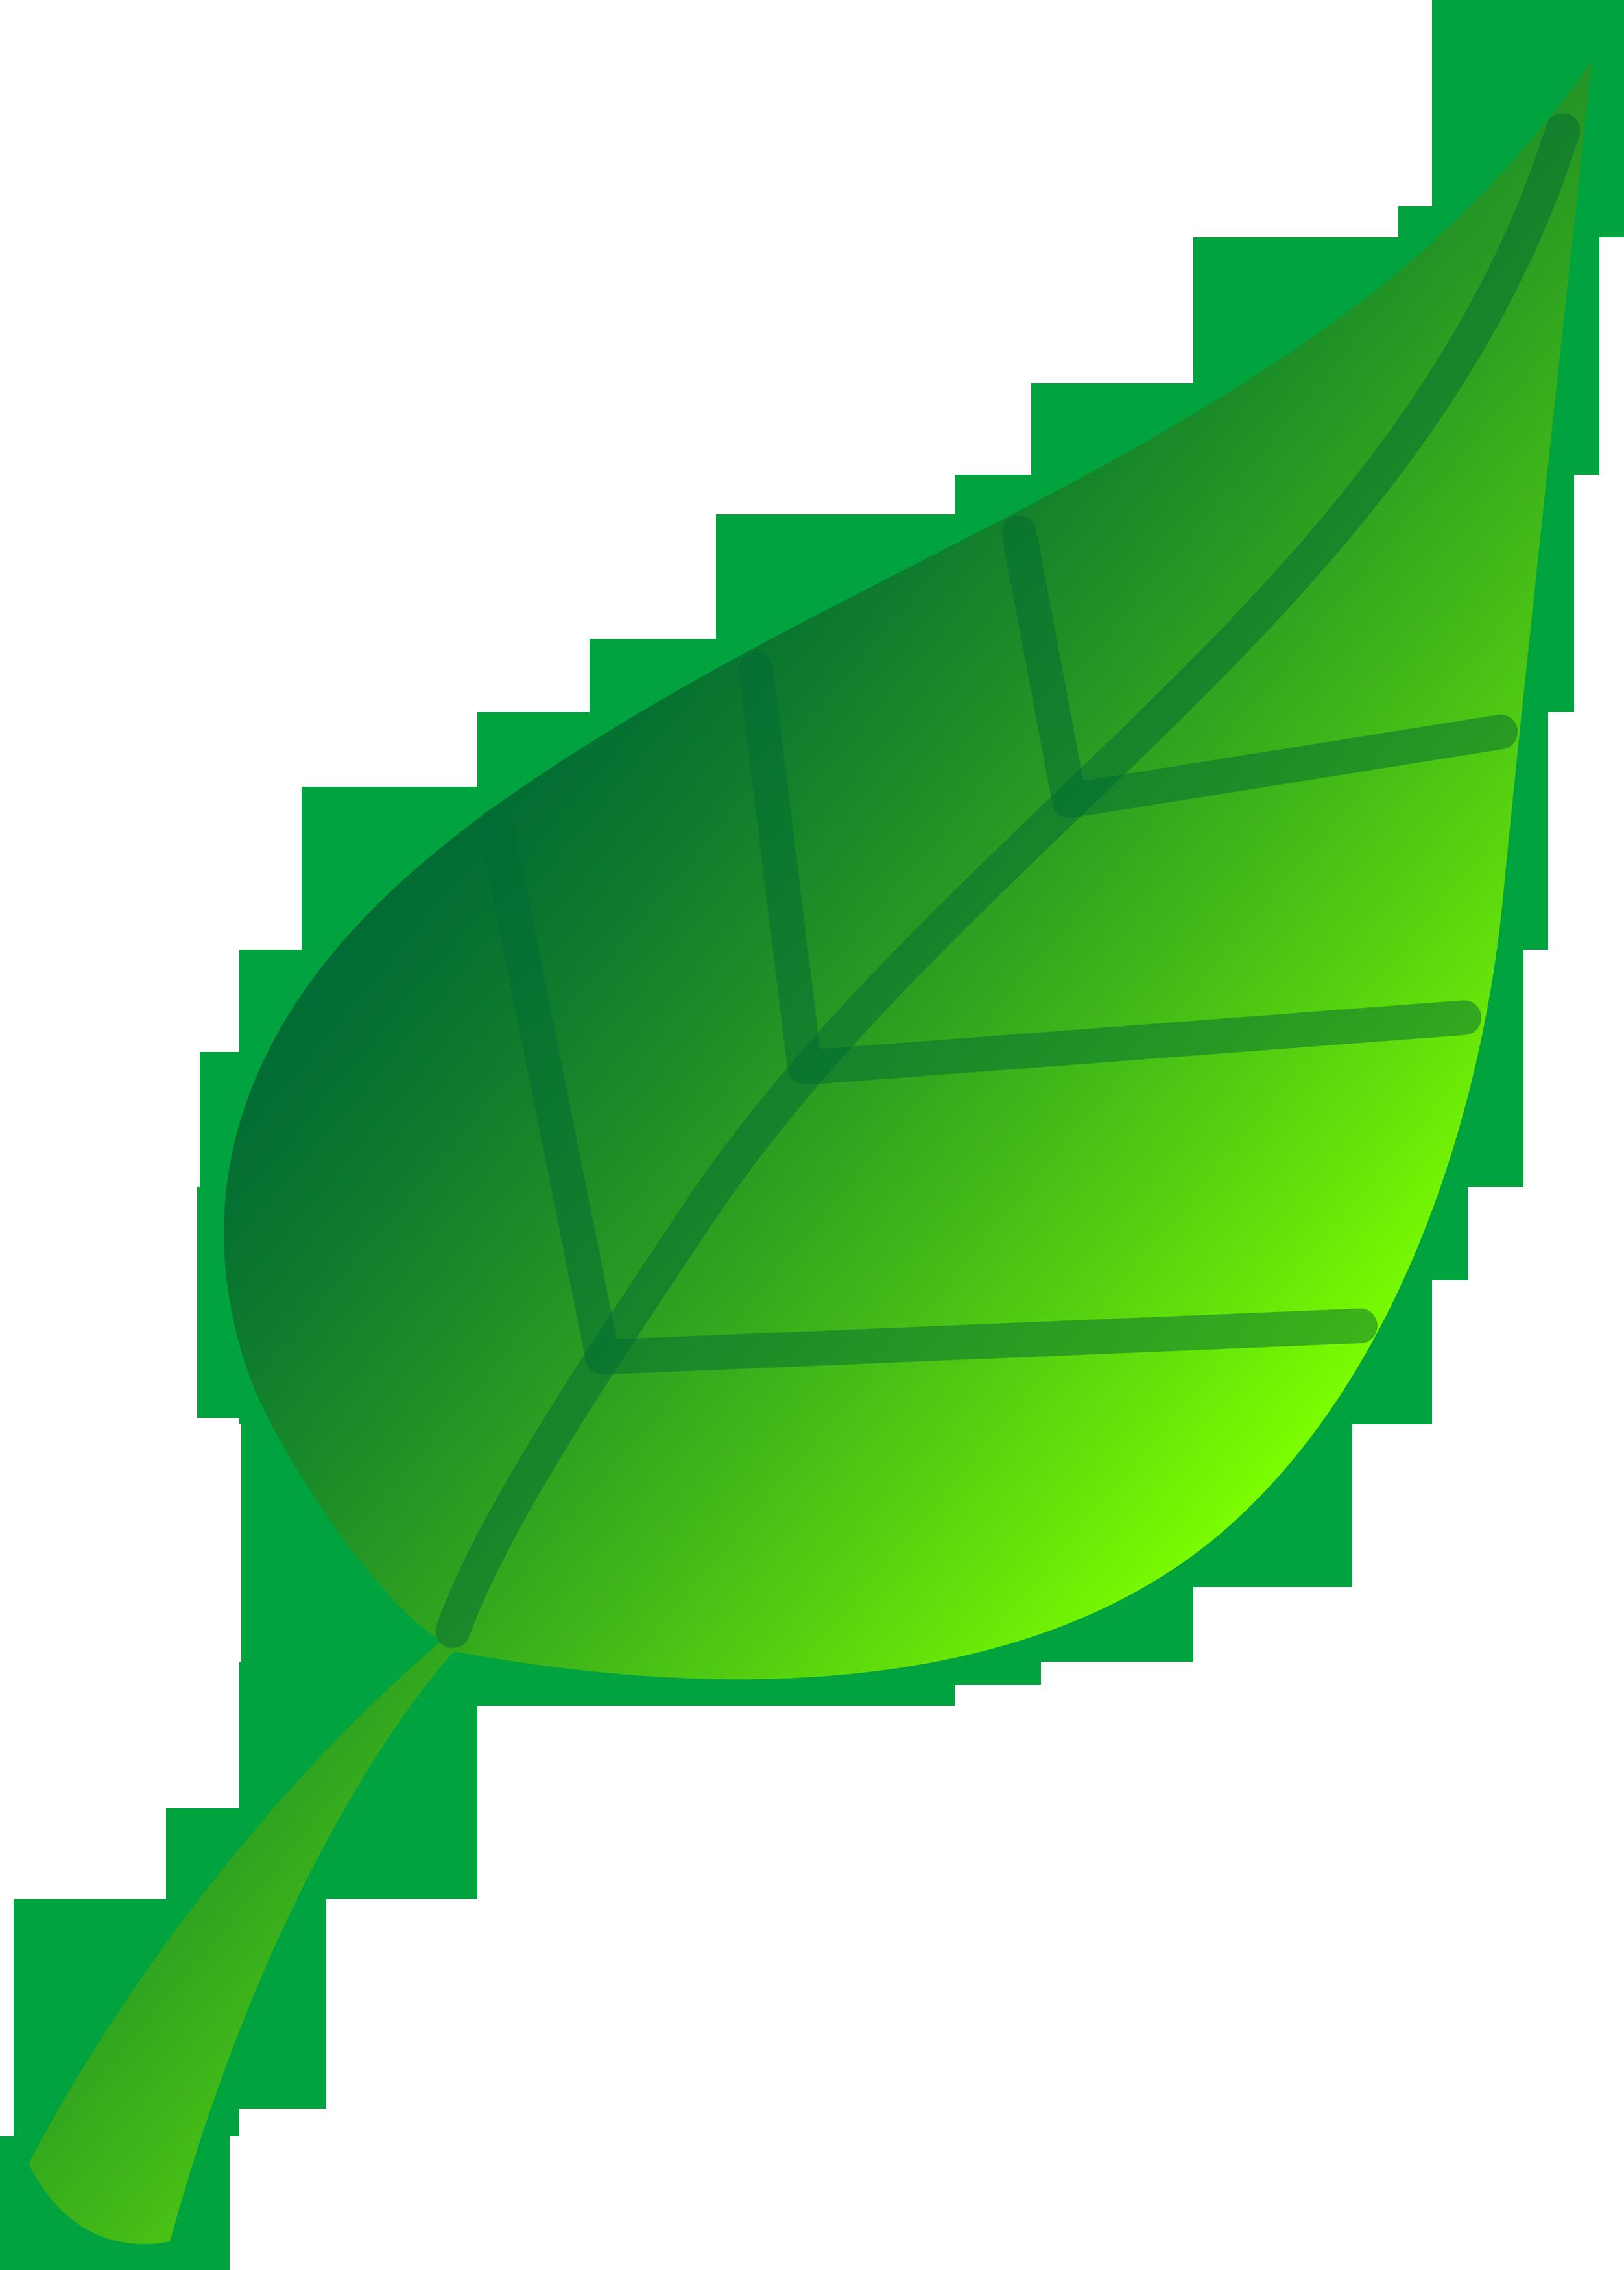 Leaves Leaf Png Free Png Images 2